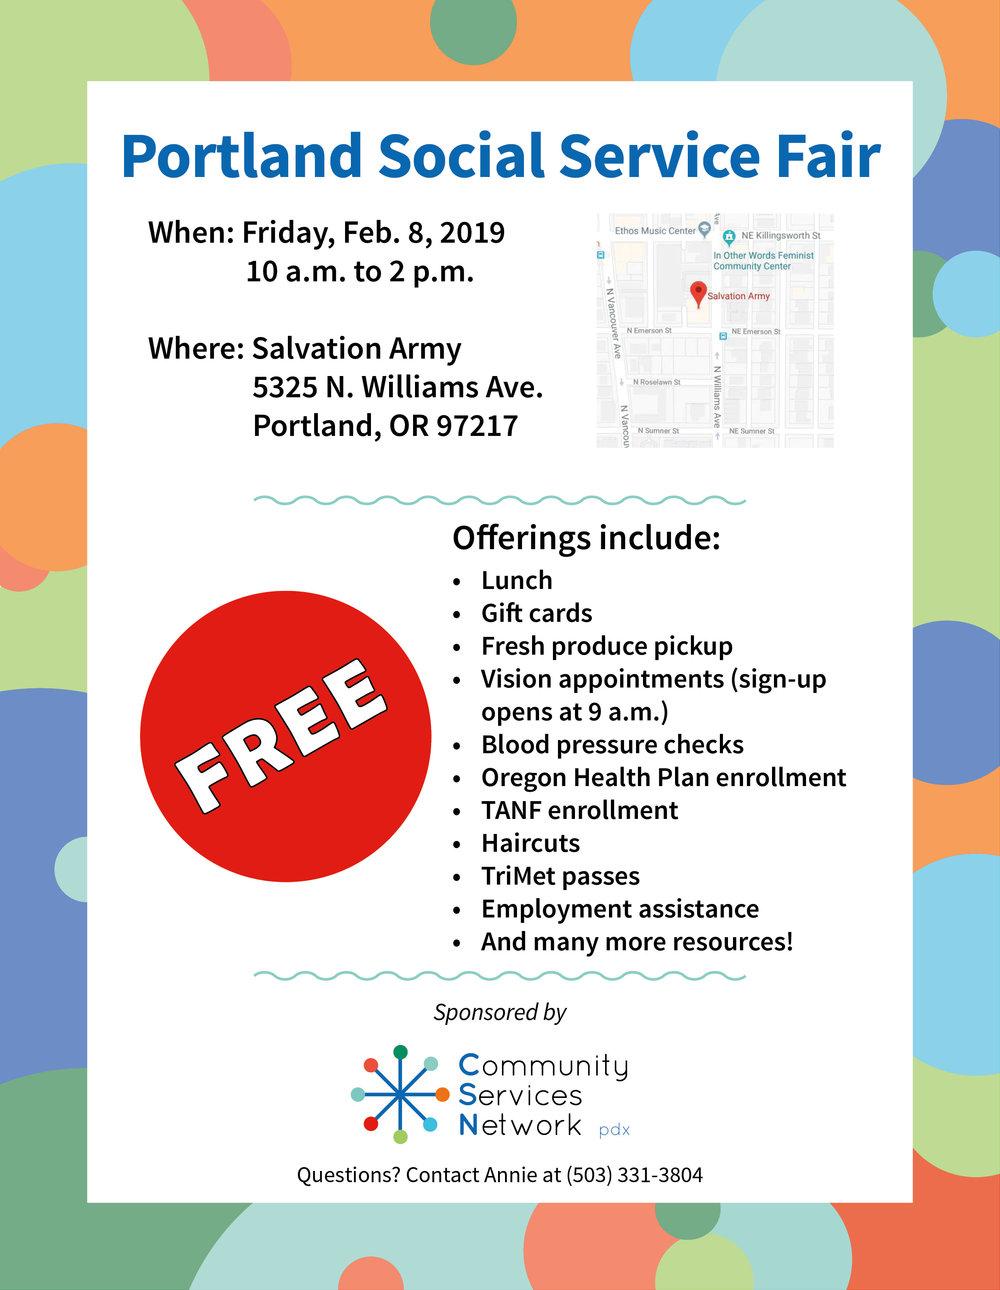 Social Service Fair #2 Flyer - 8.5x11 - Feb. 8, 2019 - print.jpg